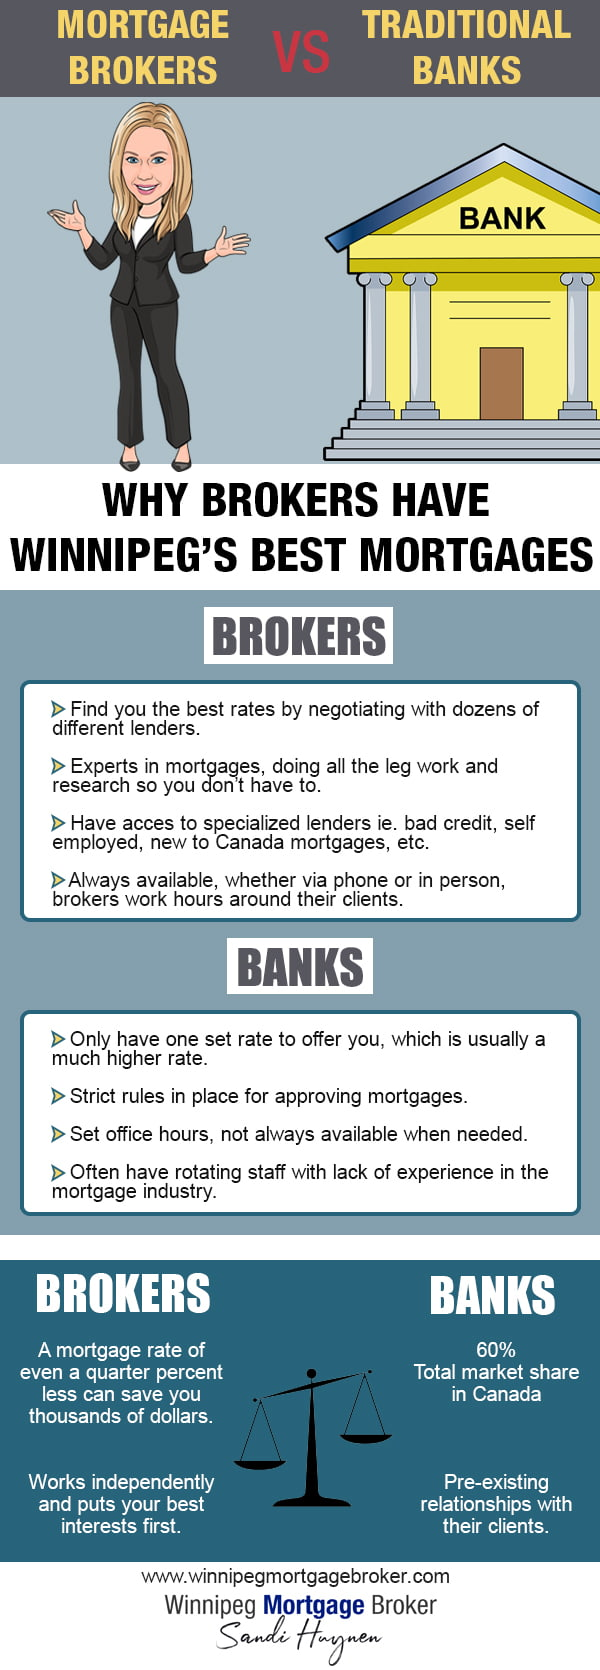 winnipeg mortgage brokers vs banks infographic